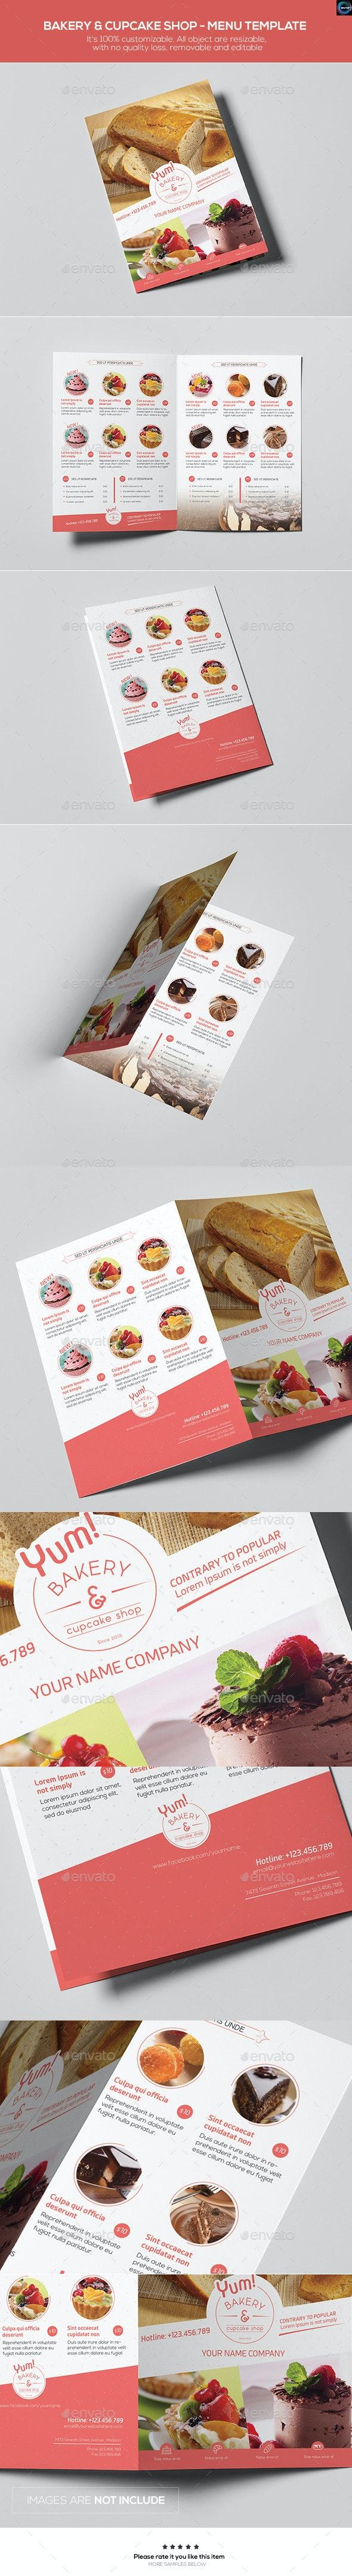 Bakery & Cupcake Shop - Menu Template - Food Menus Print Templates